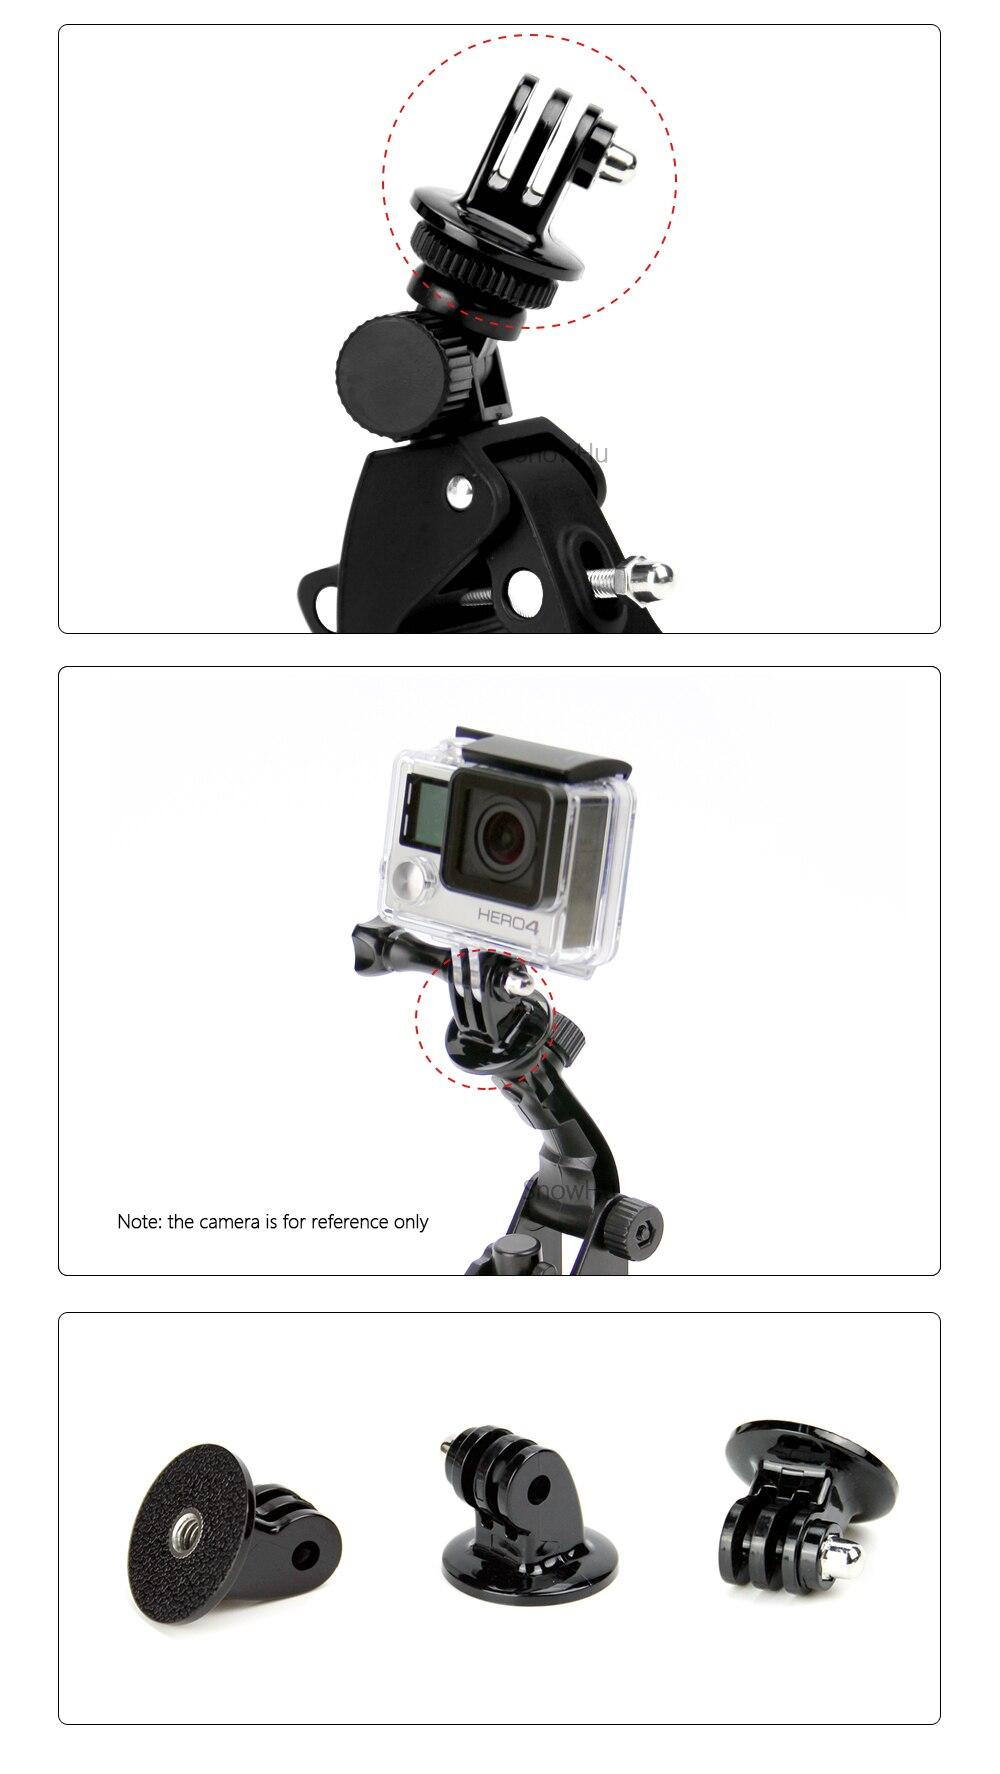 SnowHu for GoPro Accessories Mini  Monopod Tripod Holder Case Mount Adapter for Go Pro Hero 7 6 5 4 SJ4000 Xiaomi yi Camera TP03